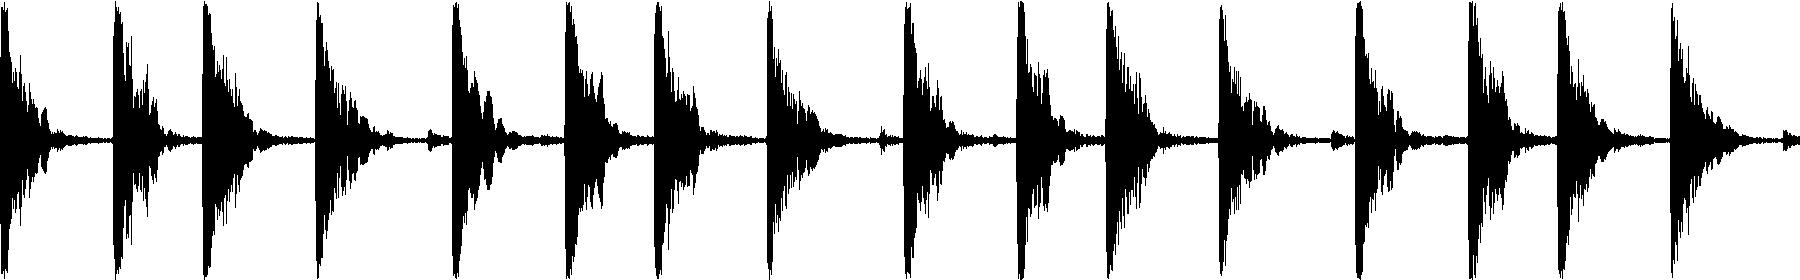 vedh melodyloop 059 dm9 gm9 126bpm